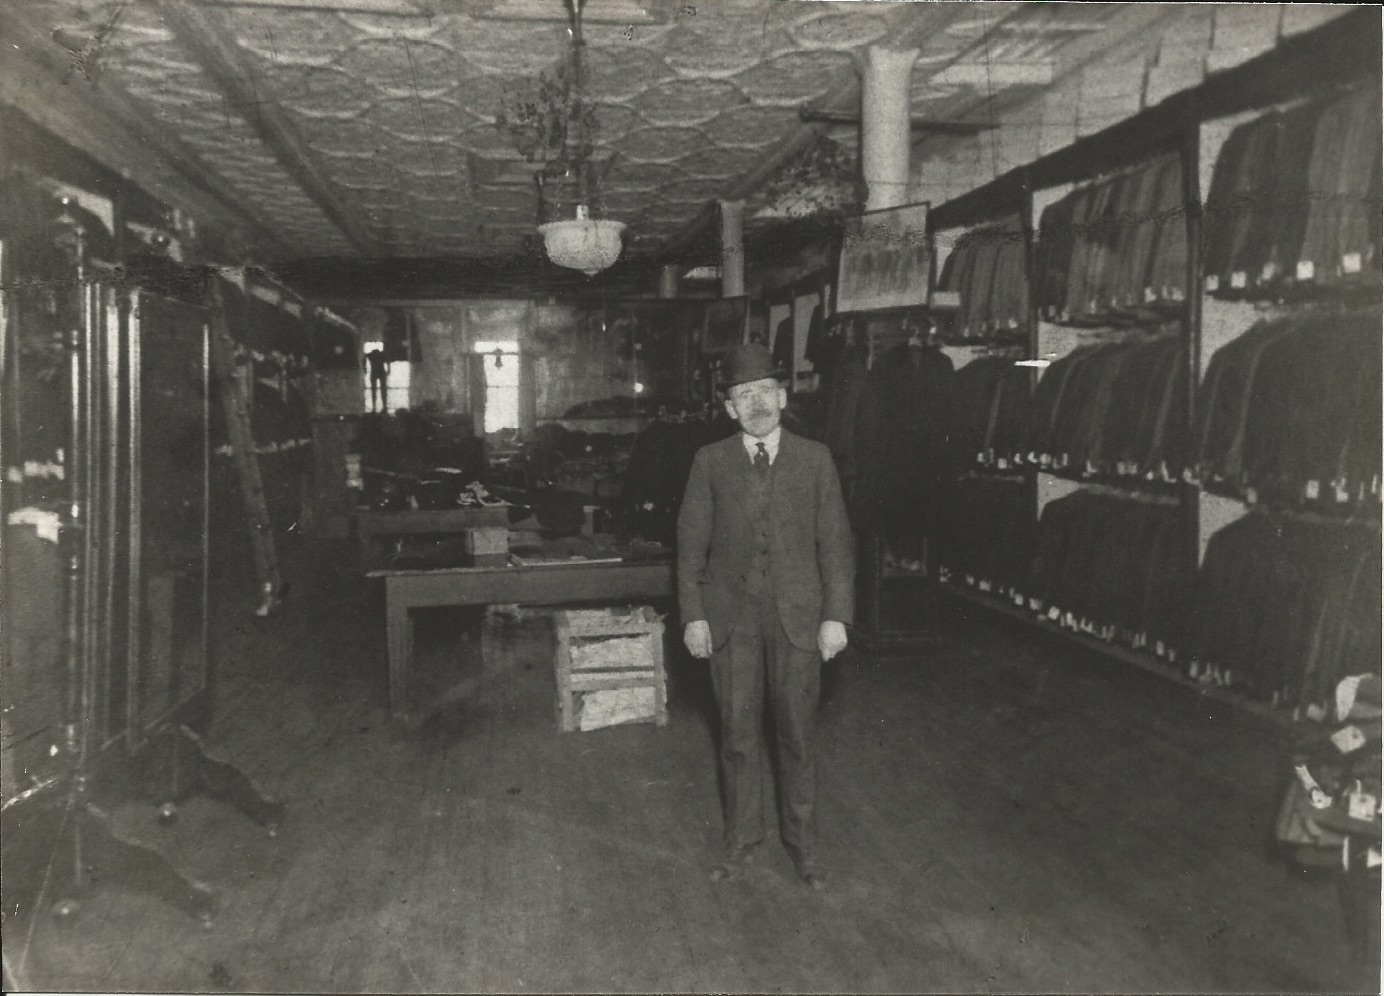 Morris Miller in the Miller Bros. store, Pitkin Avenue, Brownsville, 1915